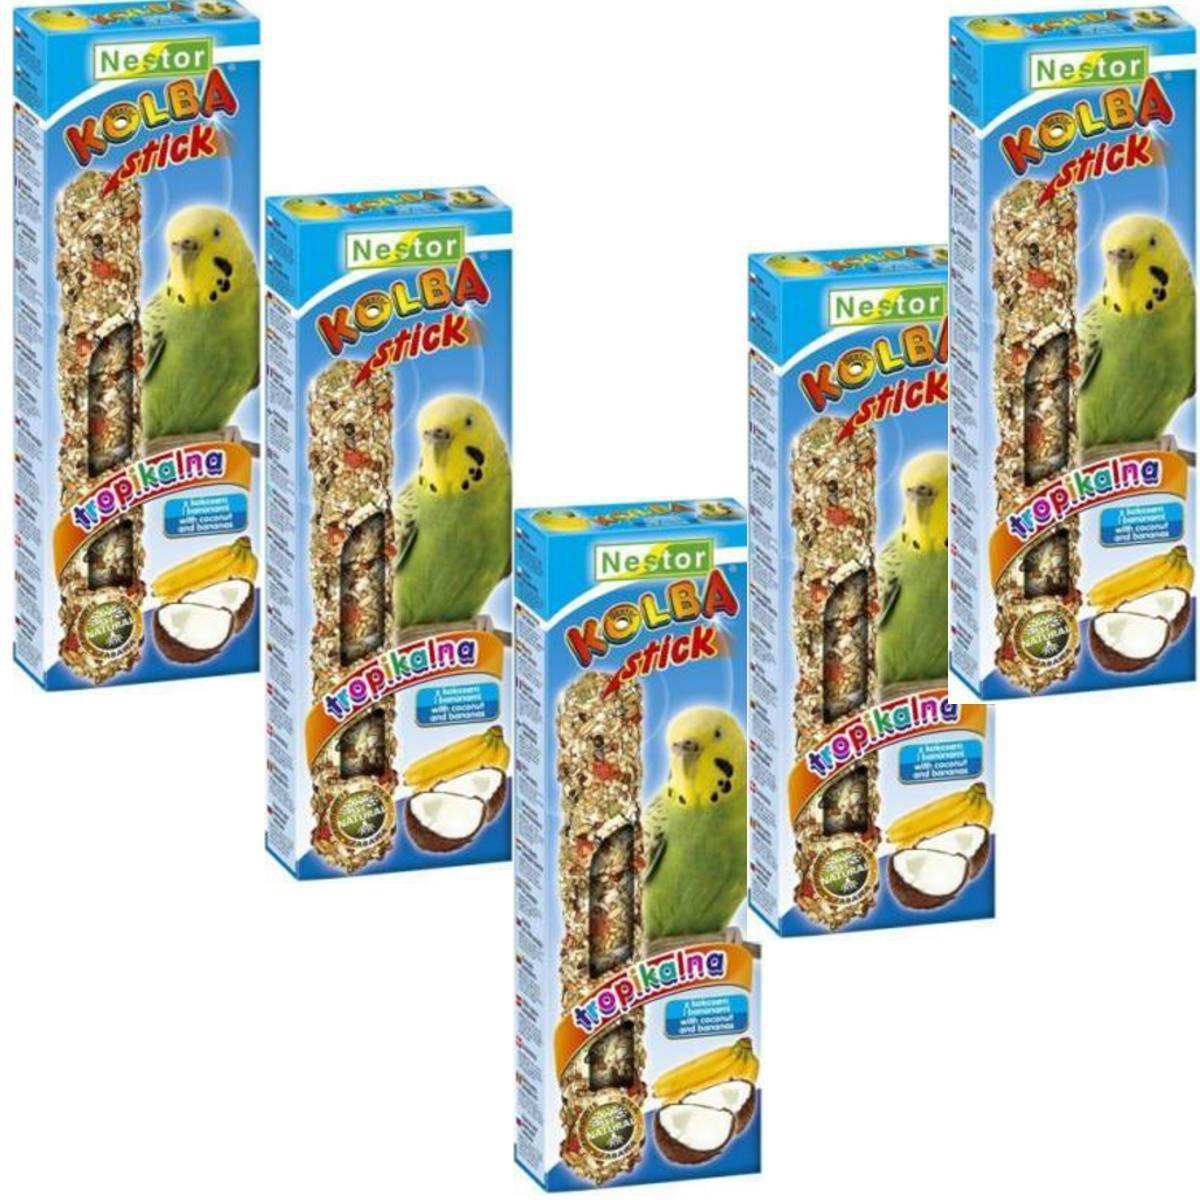 NESTOR pájaro Forro Periquito Con Plátano + coco 5x 2unidades paquetes akku-knabber Sticks